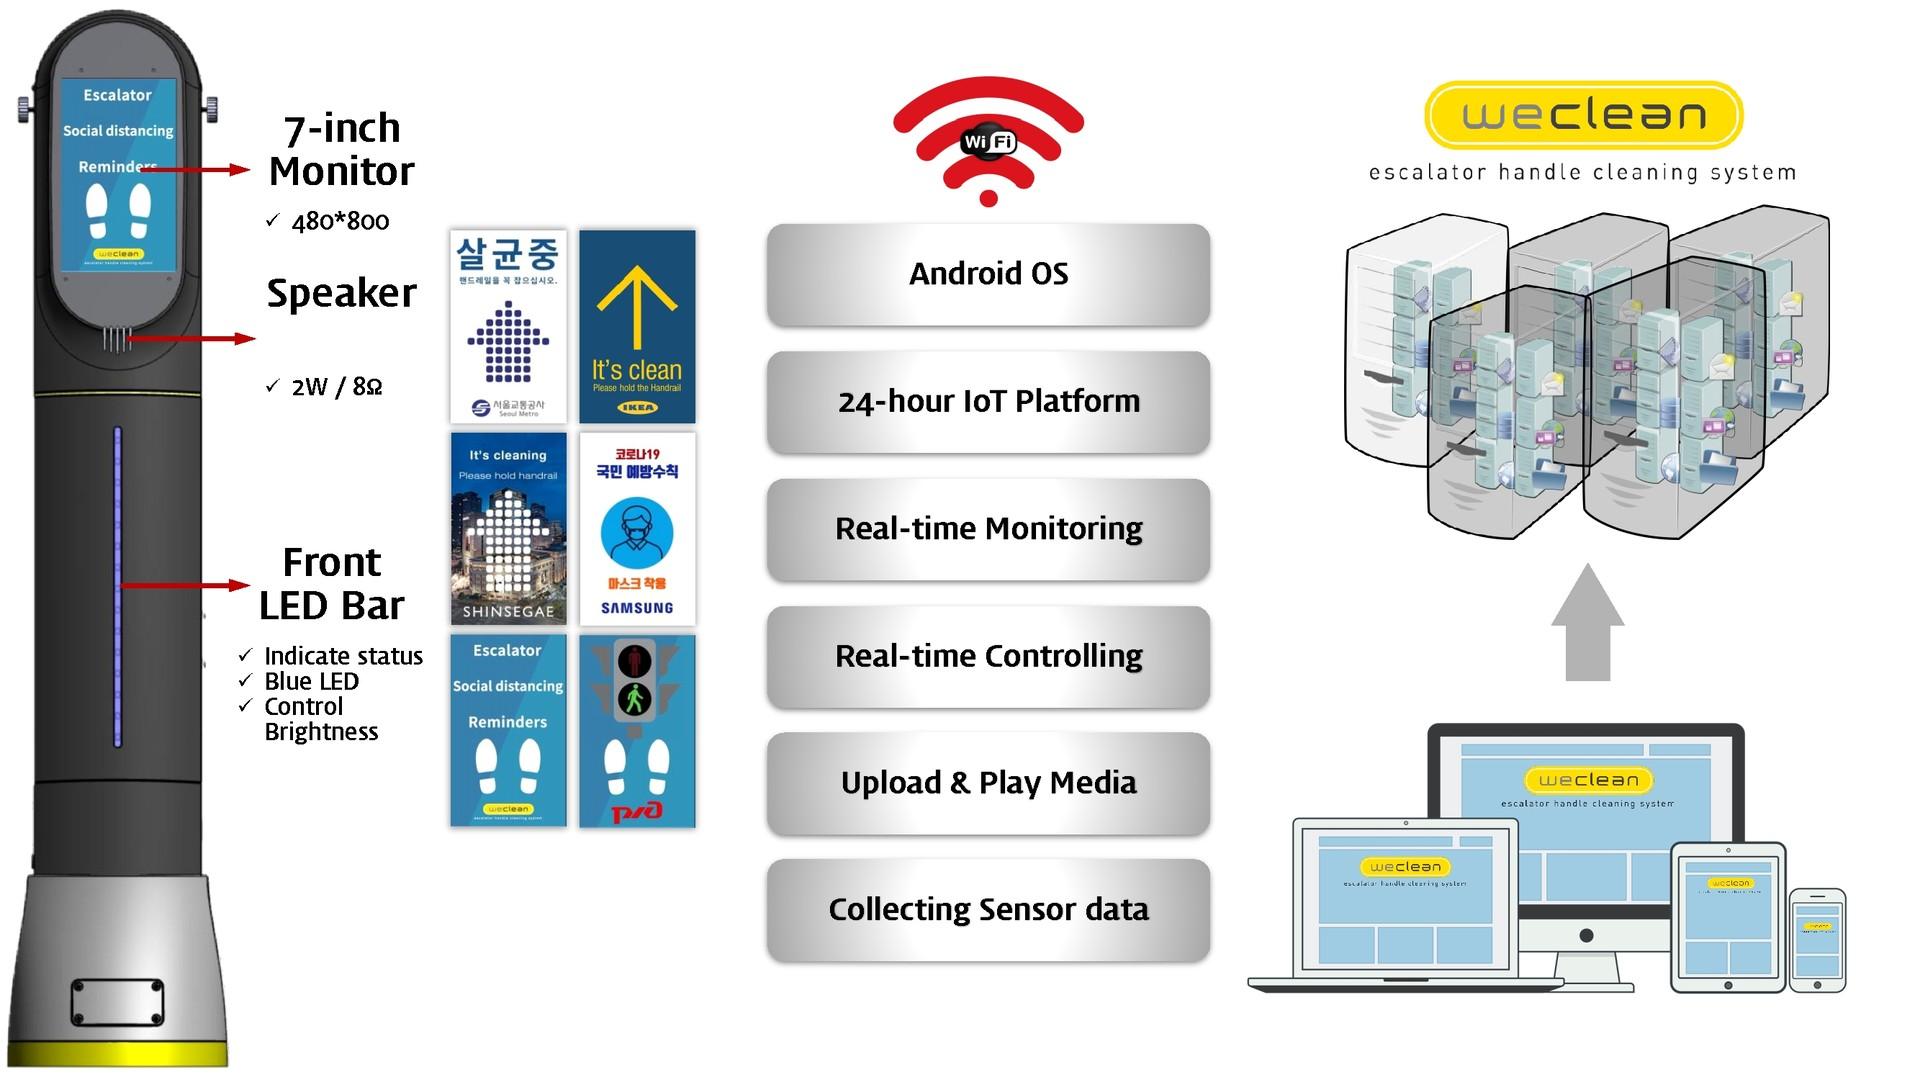 weclean : fully manage via IoT platform